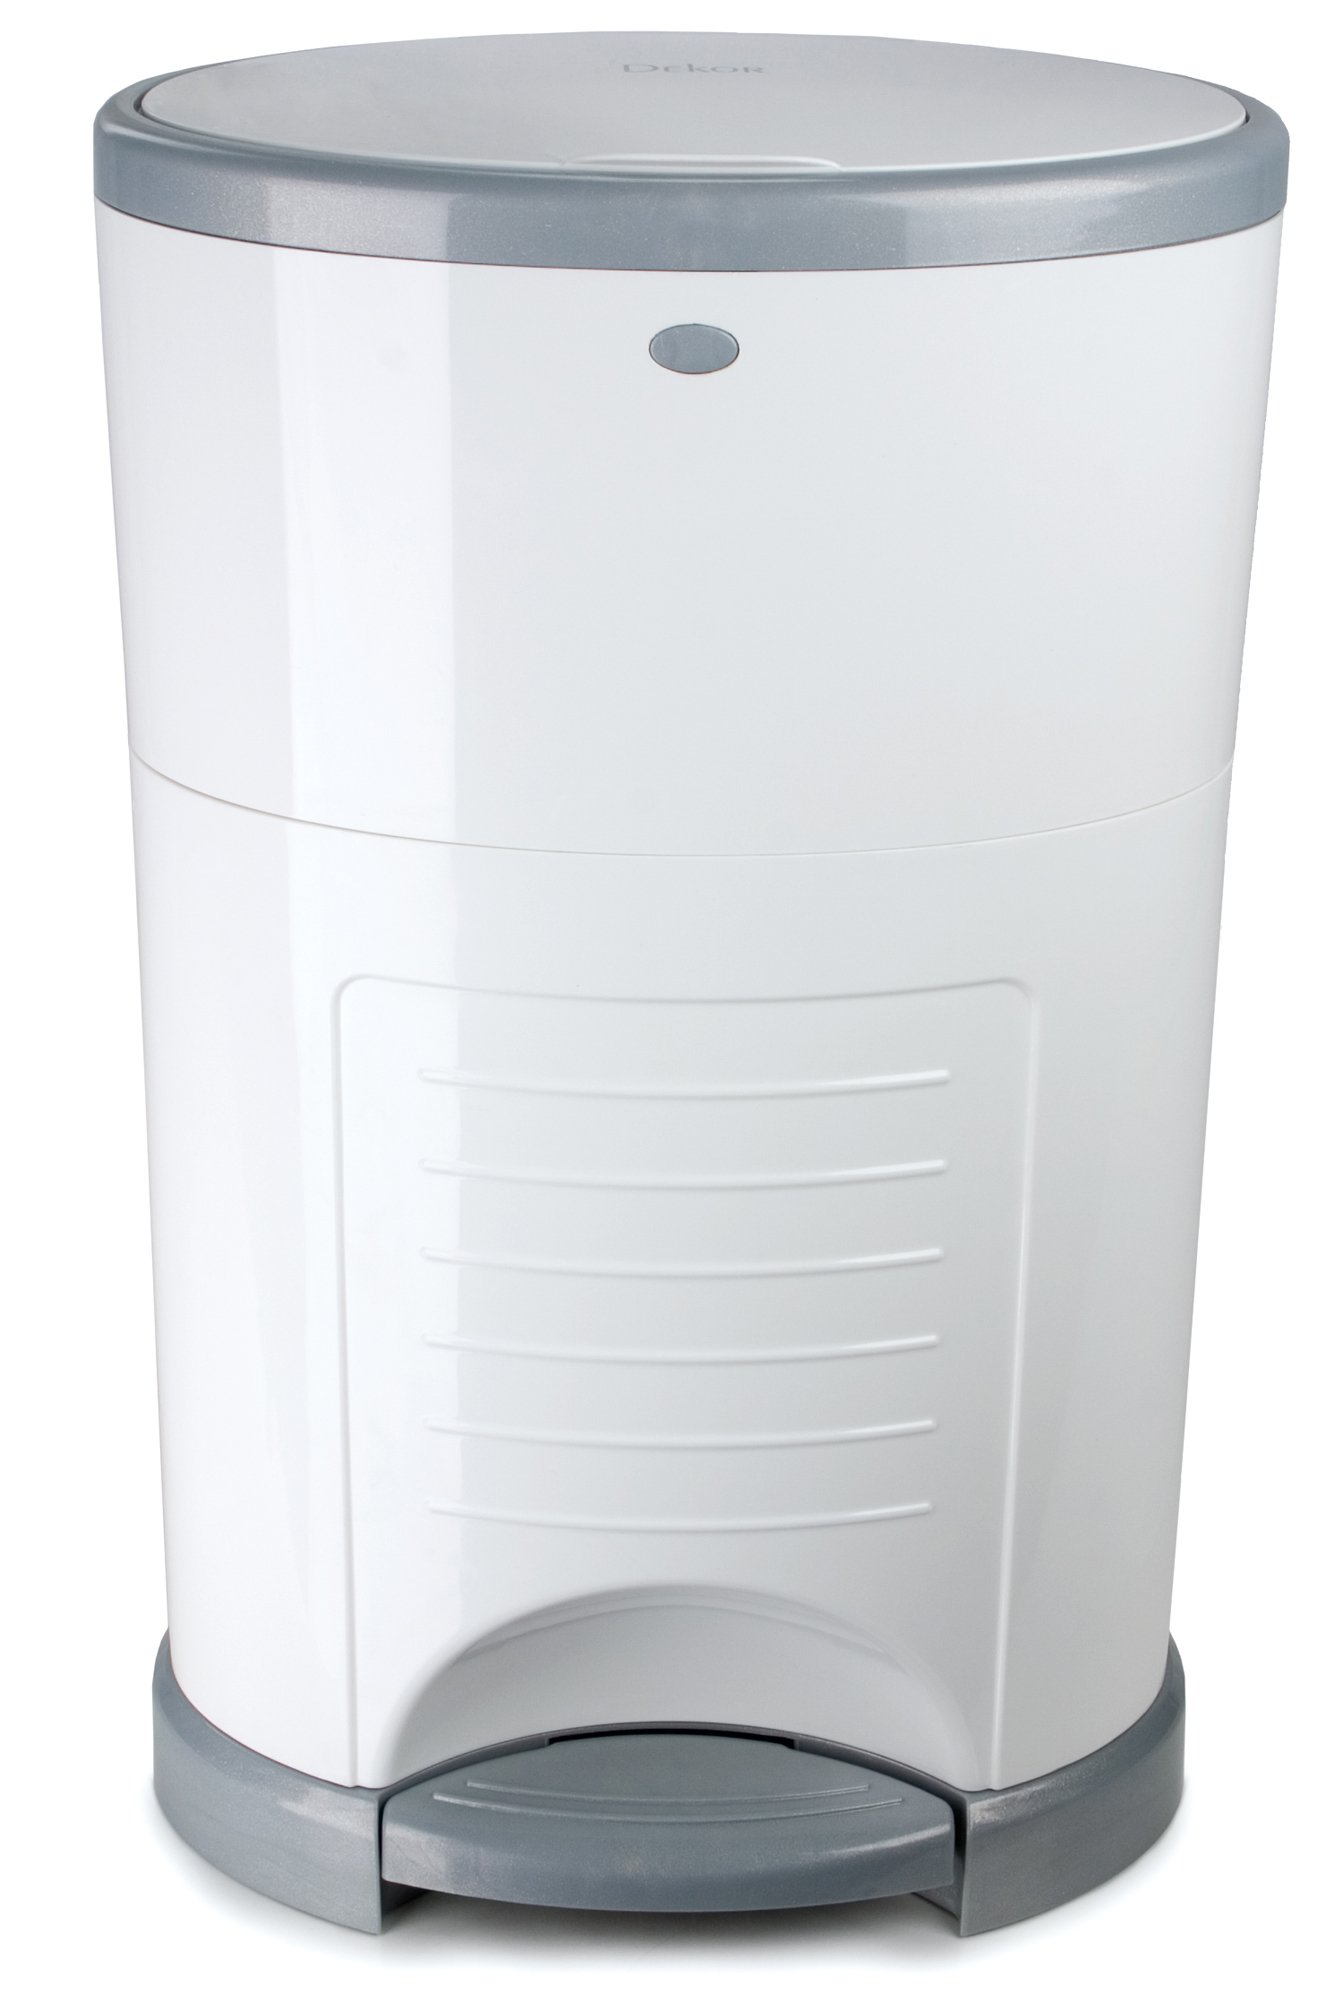 Upc 744953000389 for Dekor classic diaper pail refills